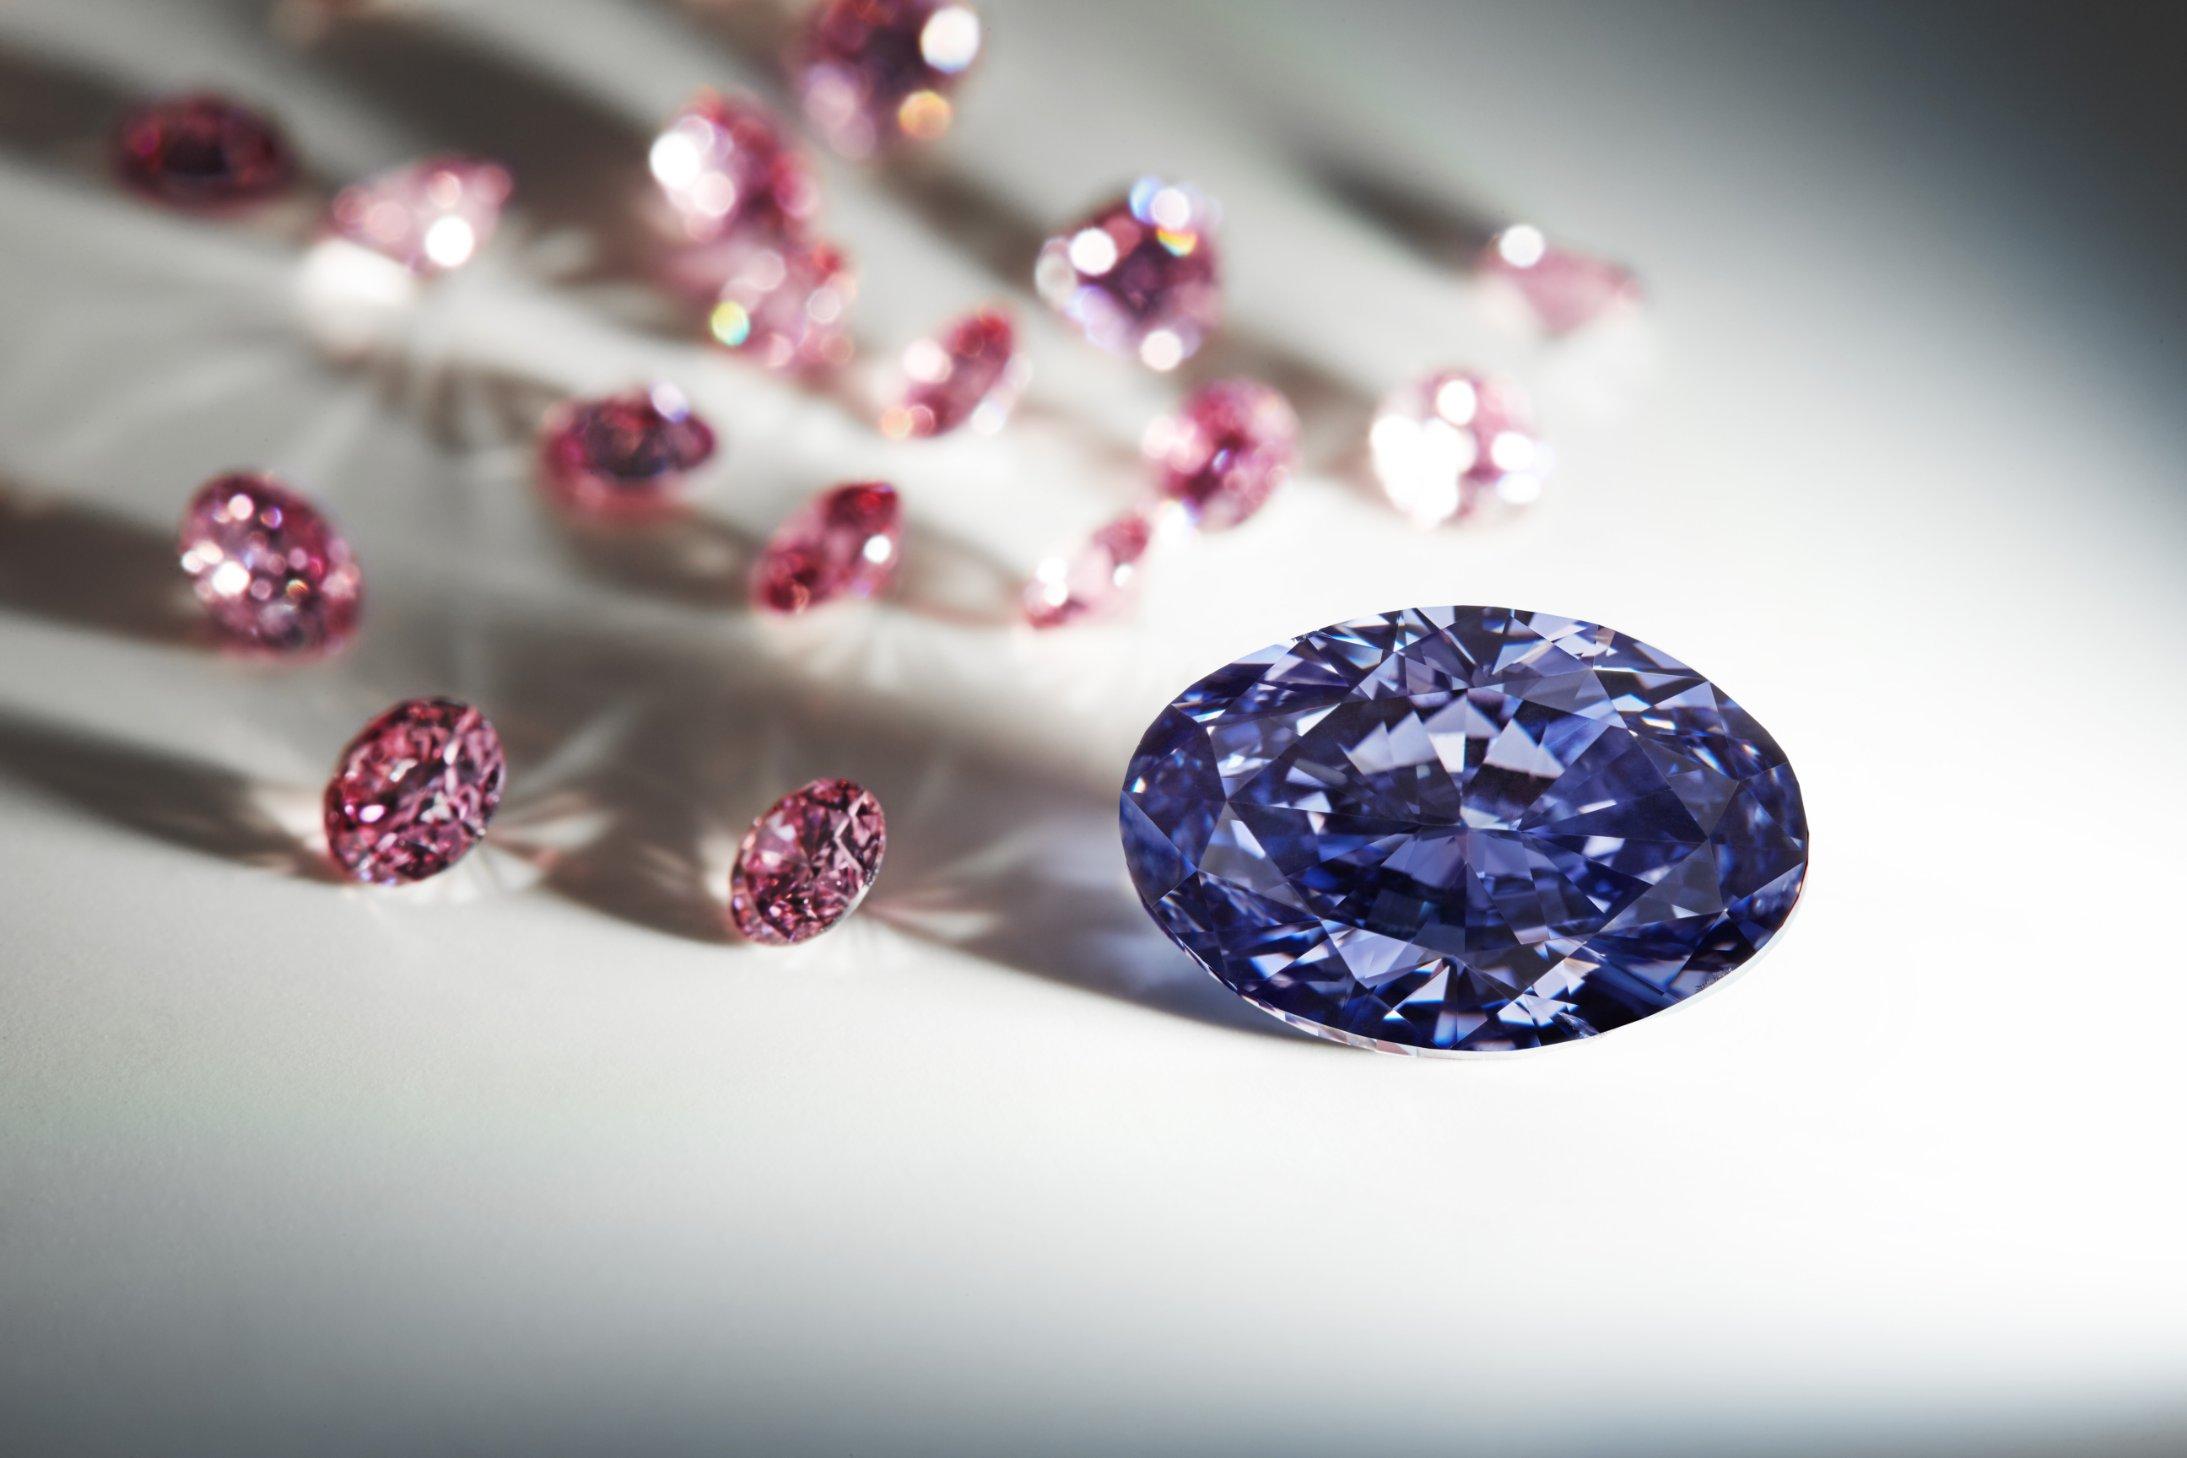 Rare $675,000 opal makes public debut - CNN Style